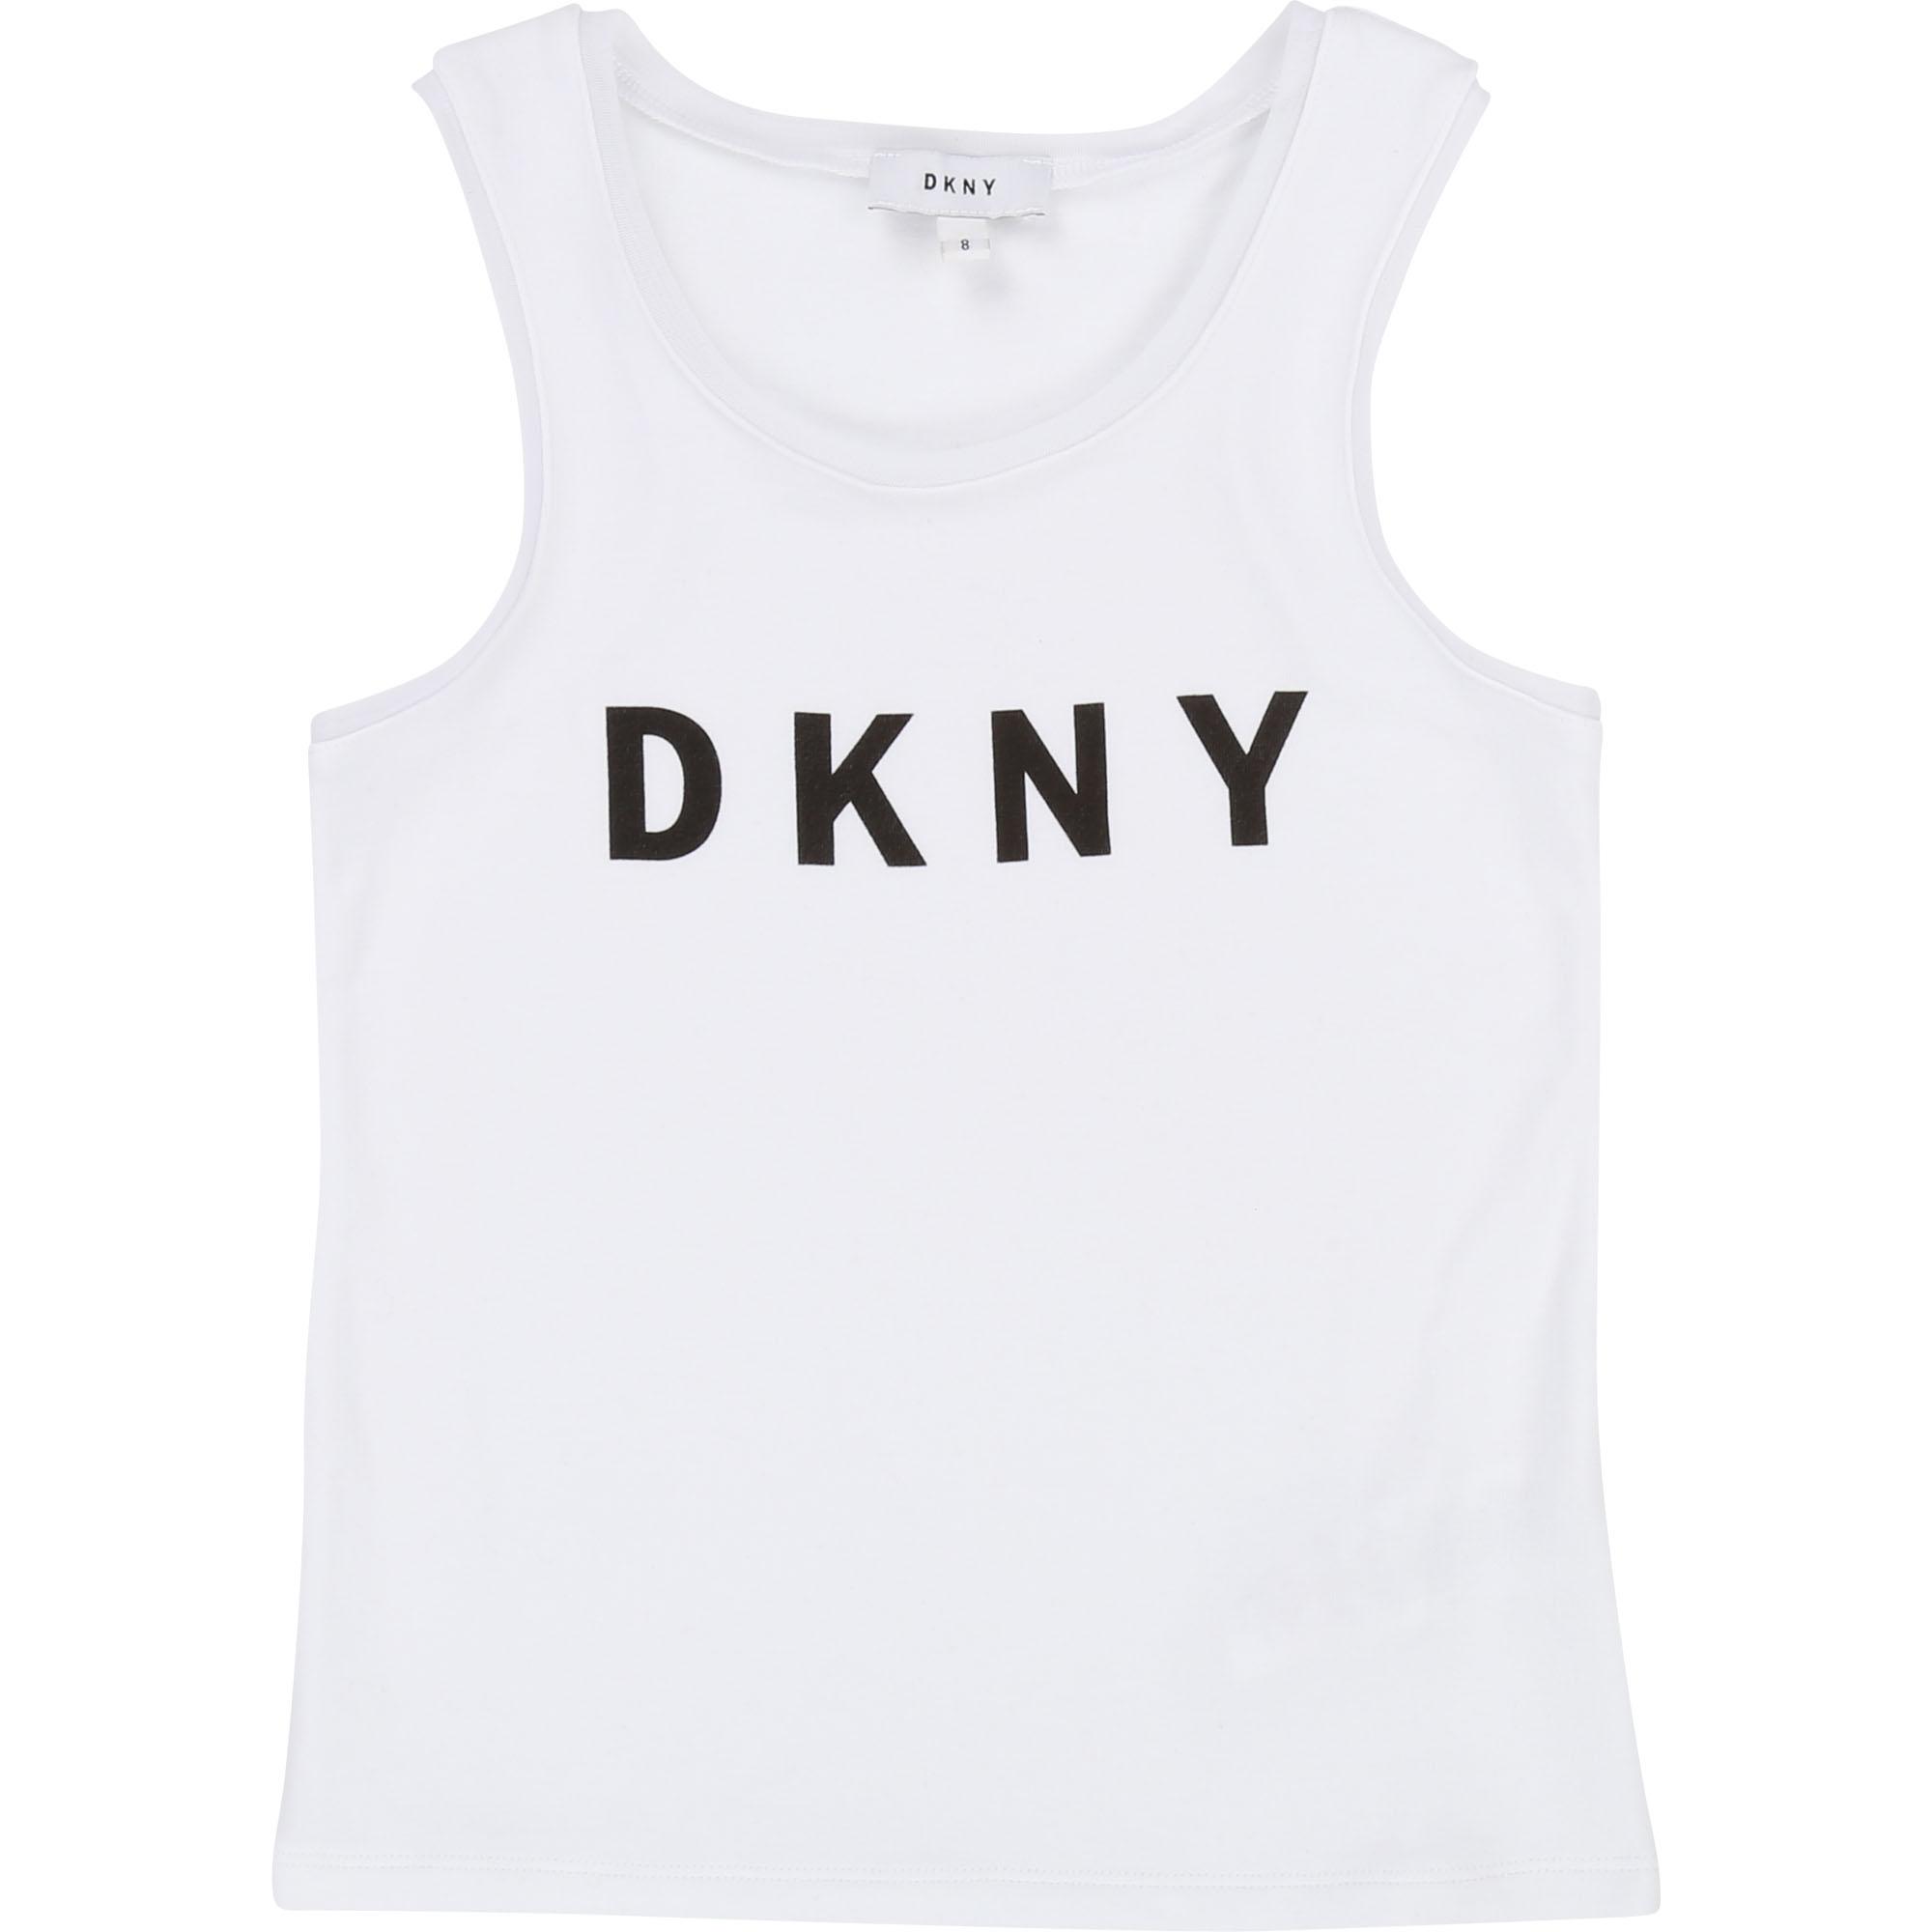 DKNY Toppi koko 150 cm ja 162 cm ALE -50% (OVH 35€)